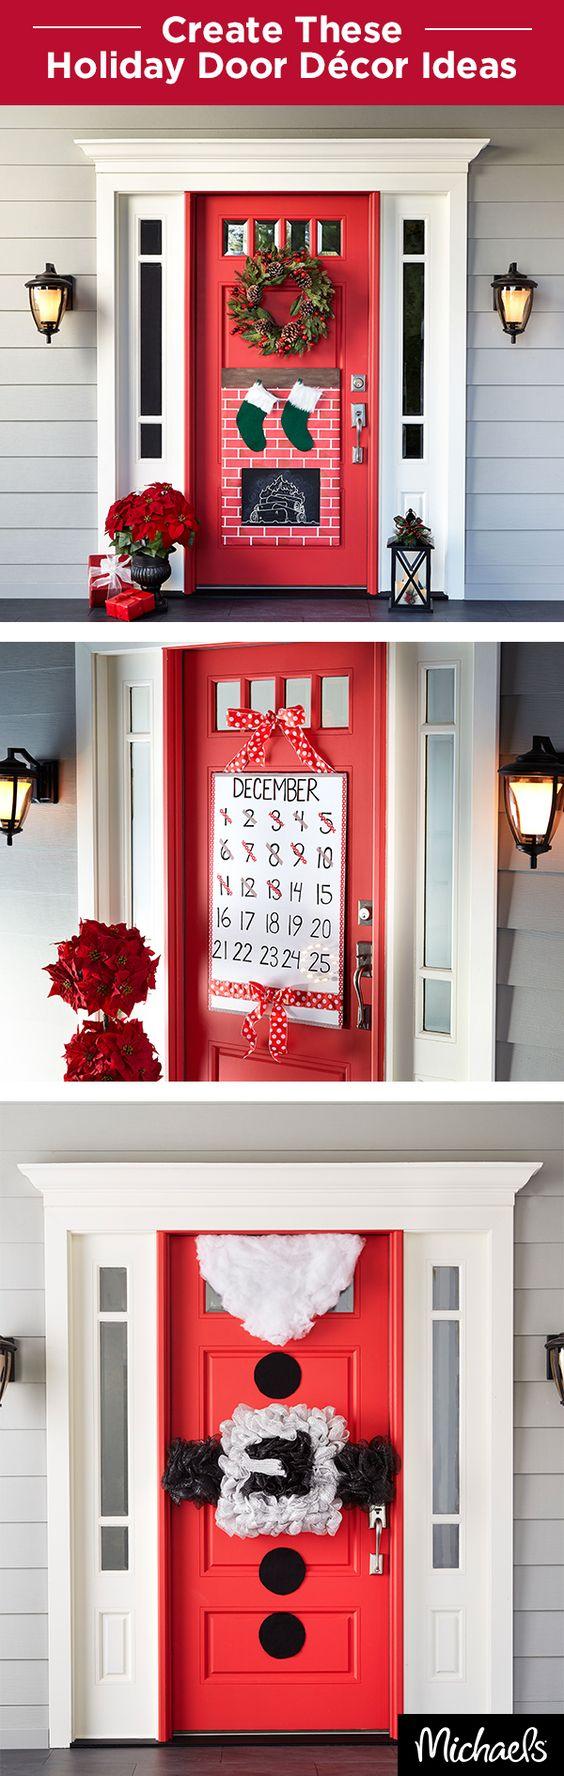 Decorate Your Front Door This Holiday Season These 3 Door